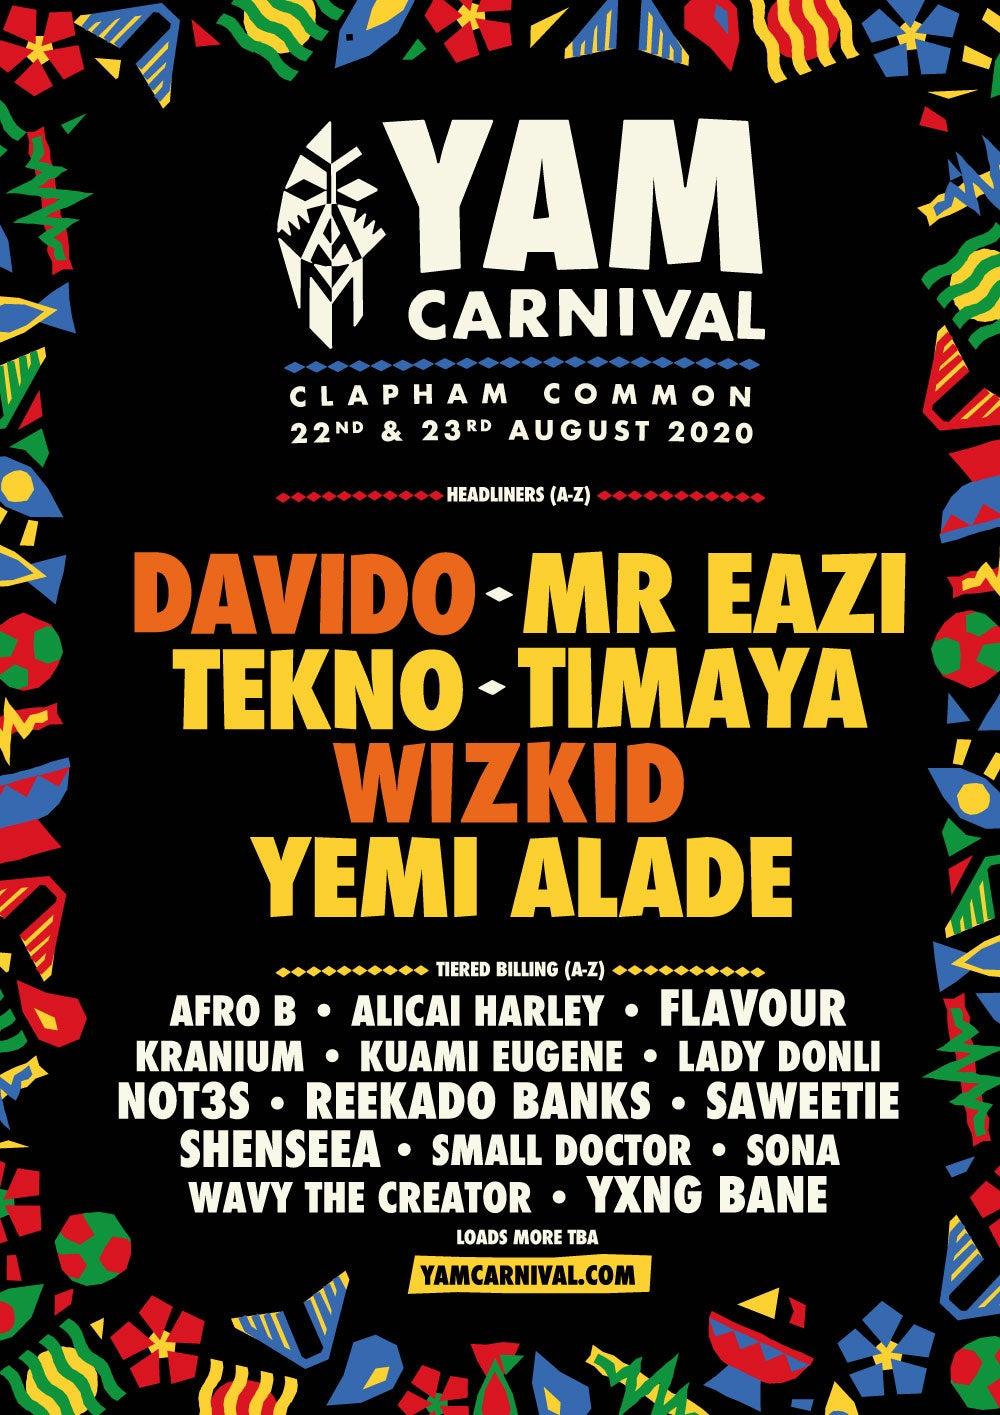 Yam Carnival London Festival Line-up Poster 2020